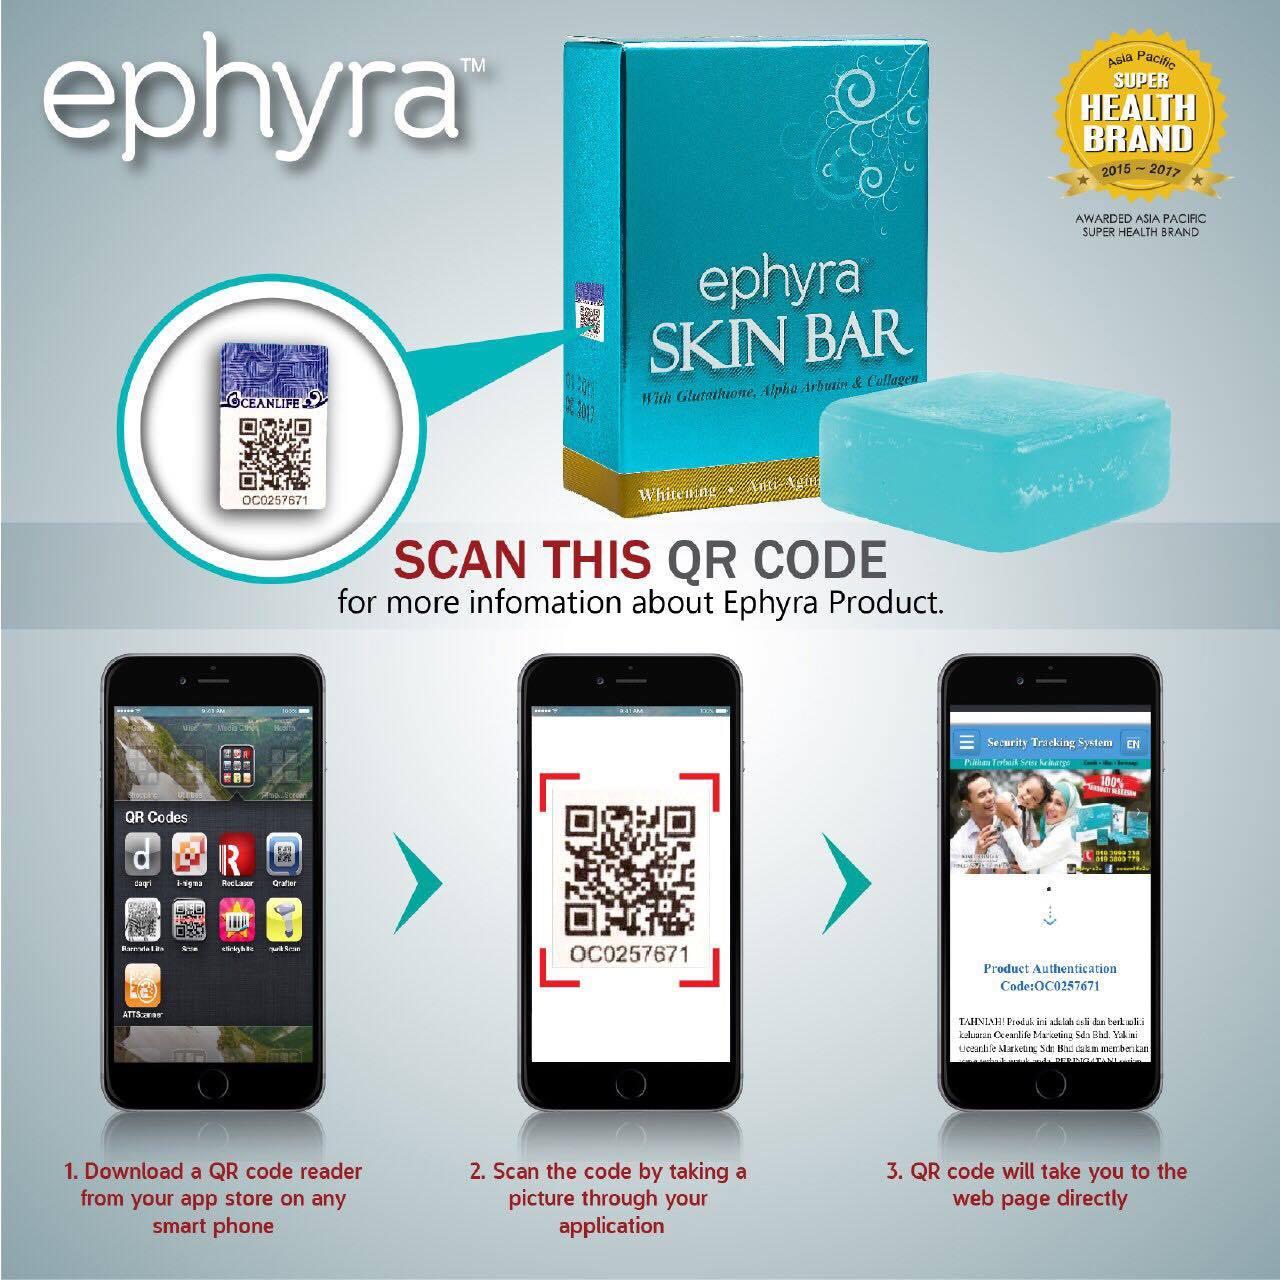 2 Cara Menghilangkan Flek Hitam Di Wajah Ada Testimoni: Kenapa Aku Setia Dengan Ephyra Skin Care Series [PROMOSI